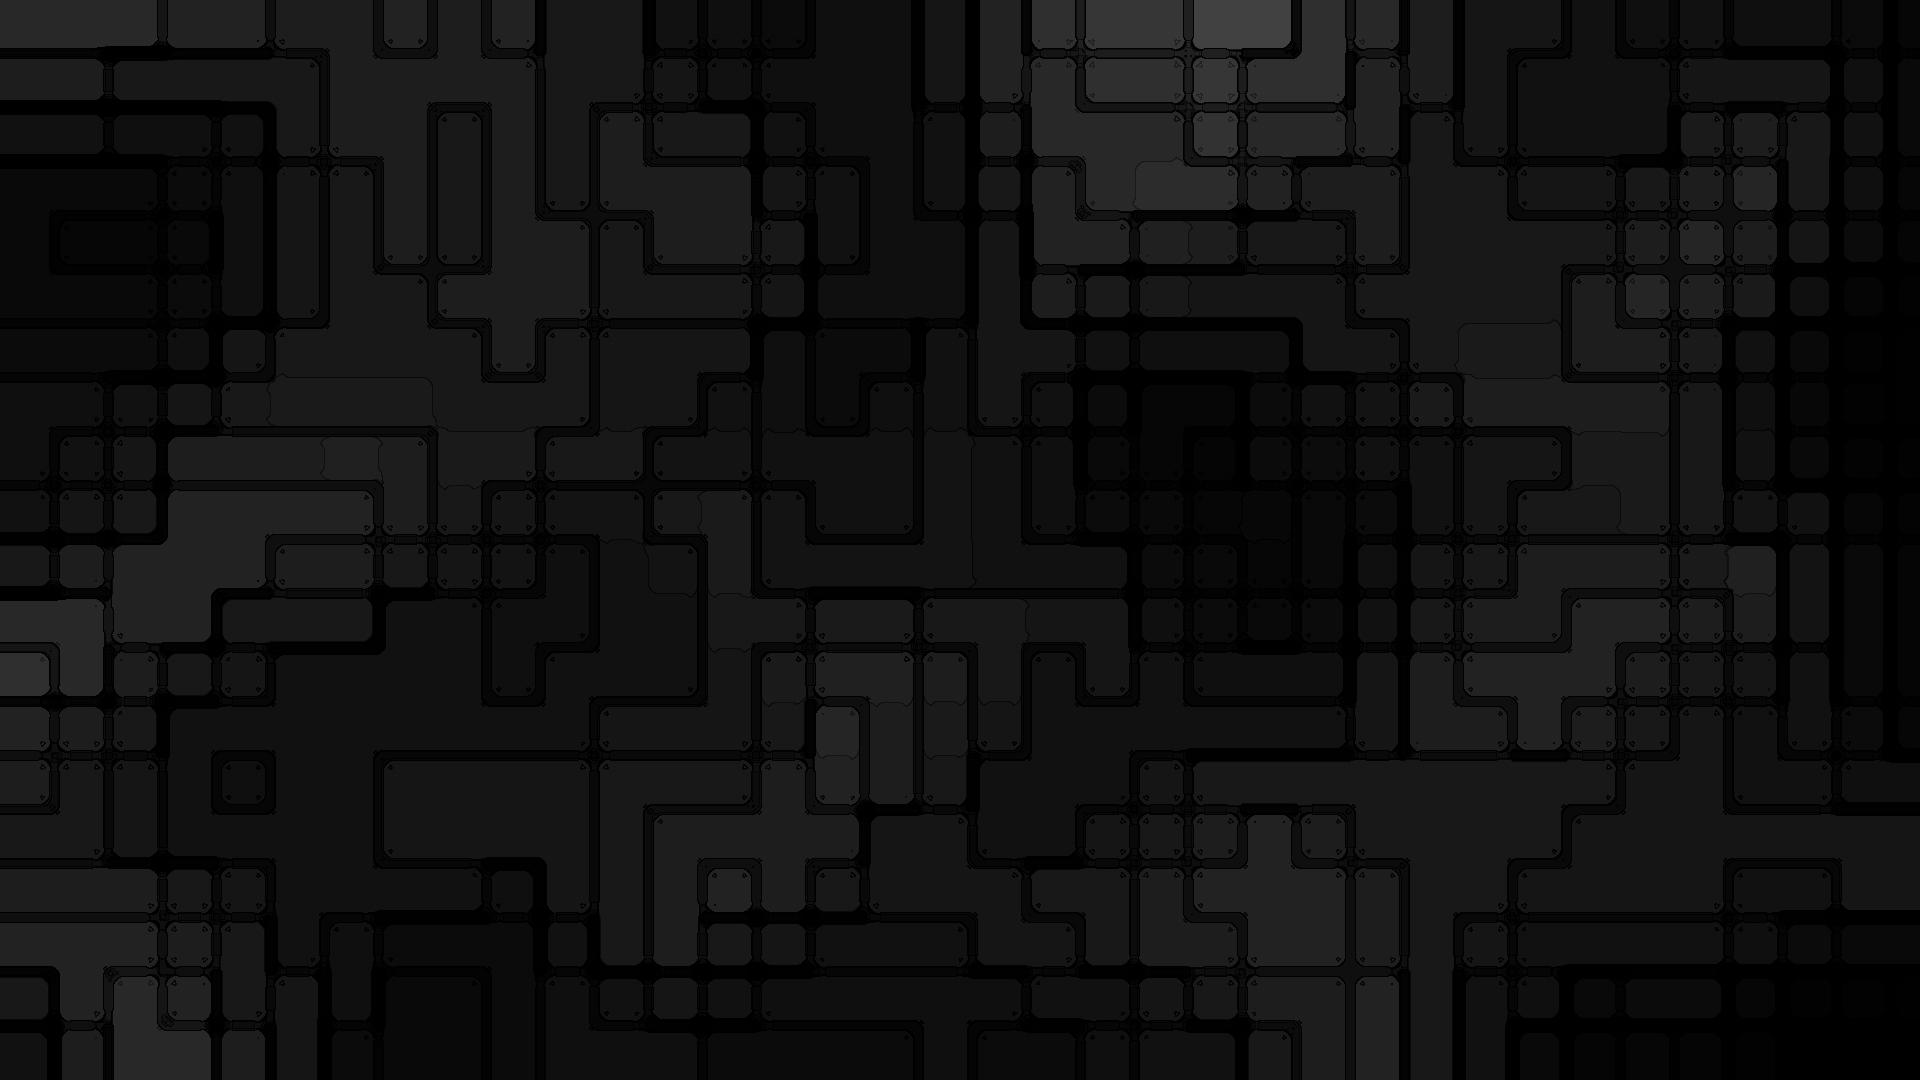 Happy New Year 2016 3d Wallpaper For Pc Abstract Grey Wallpaper Hd Pixelstalk Net